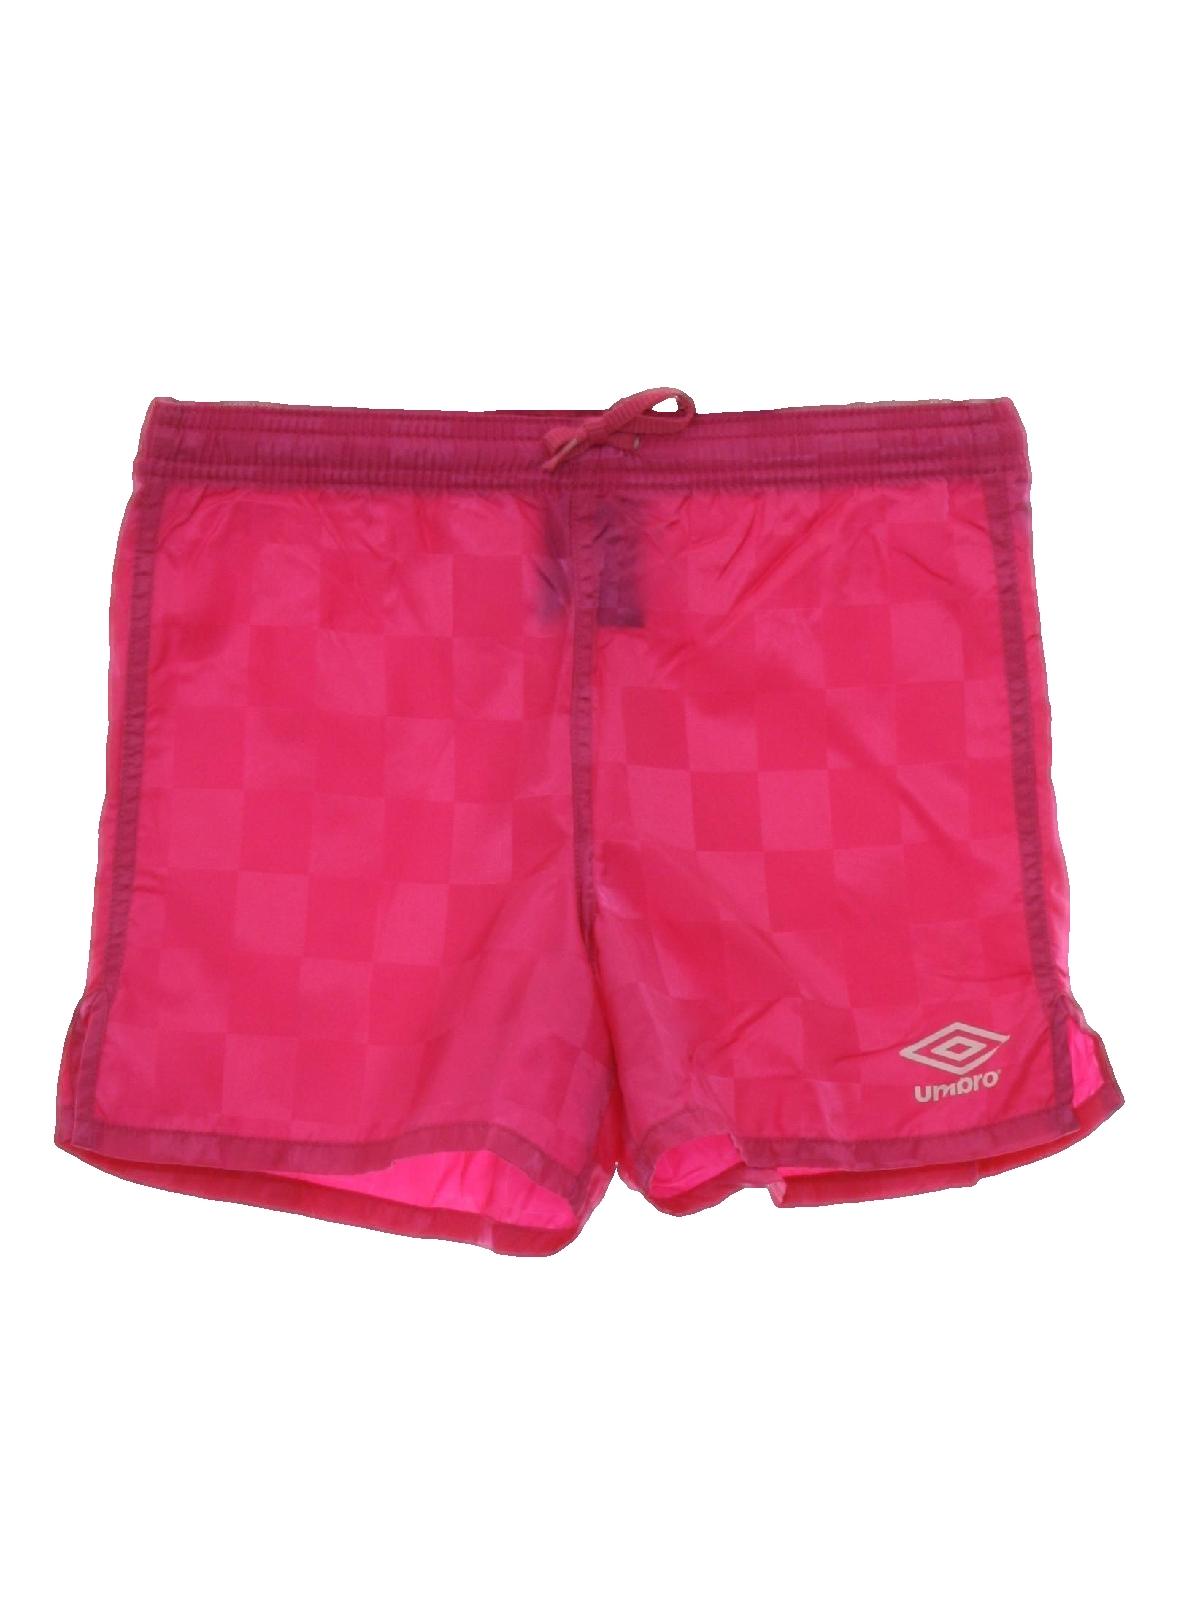 Retro 90s Shorts Umbro 90s Umbro Womens Girls Bright